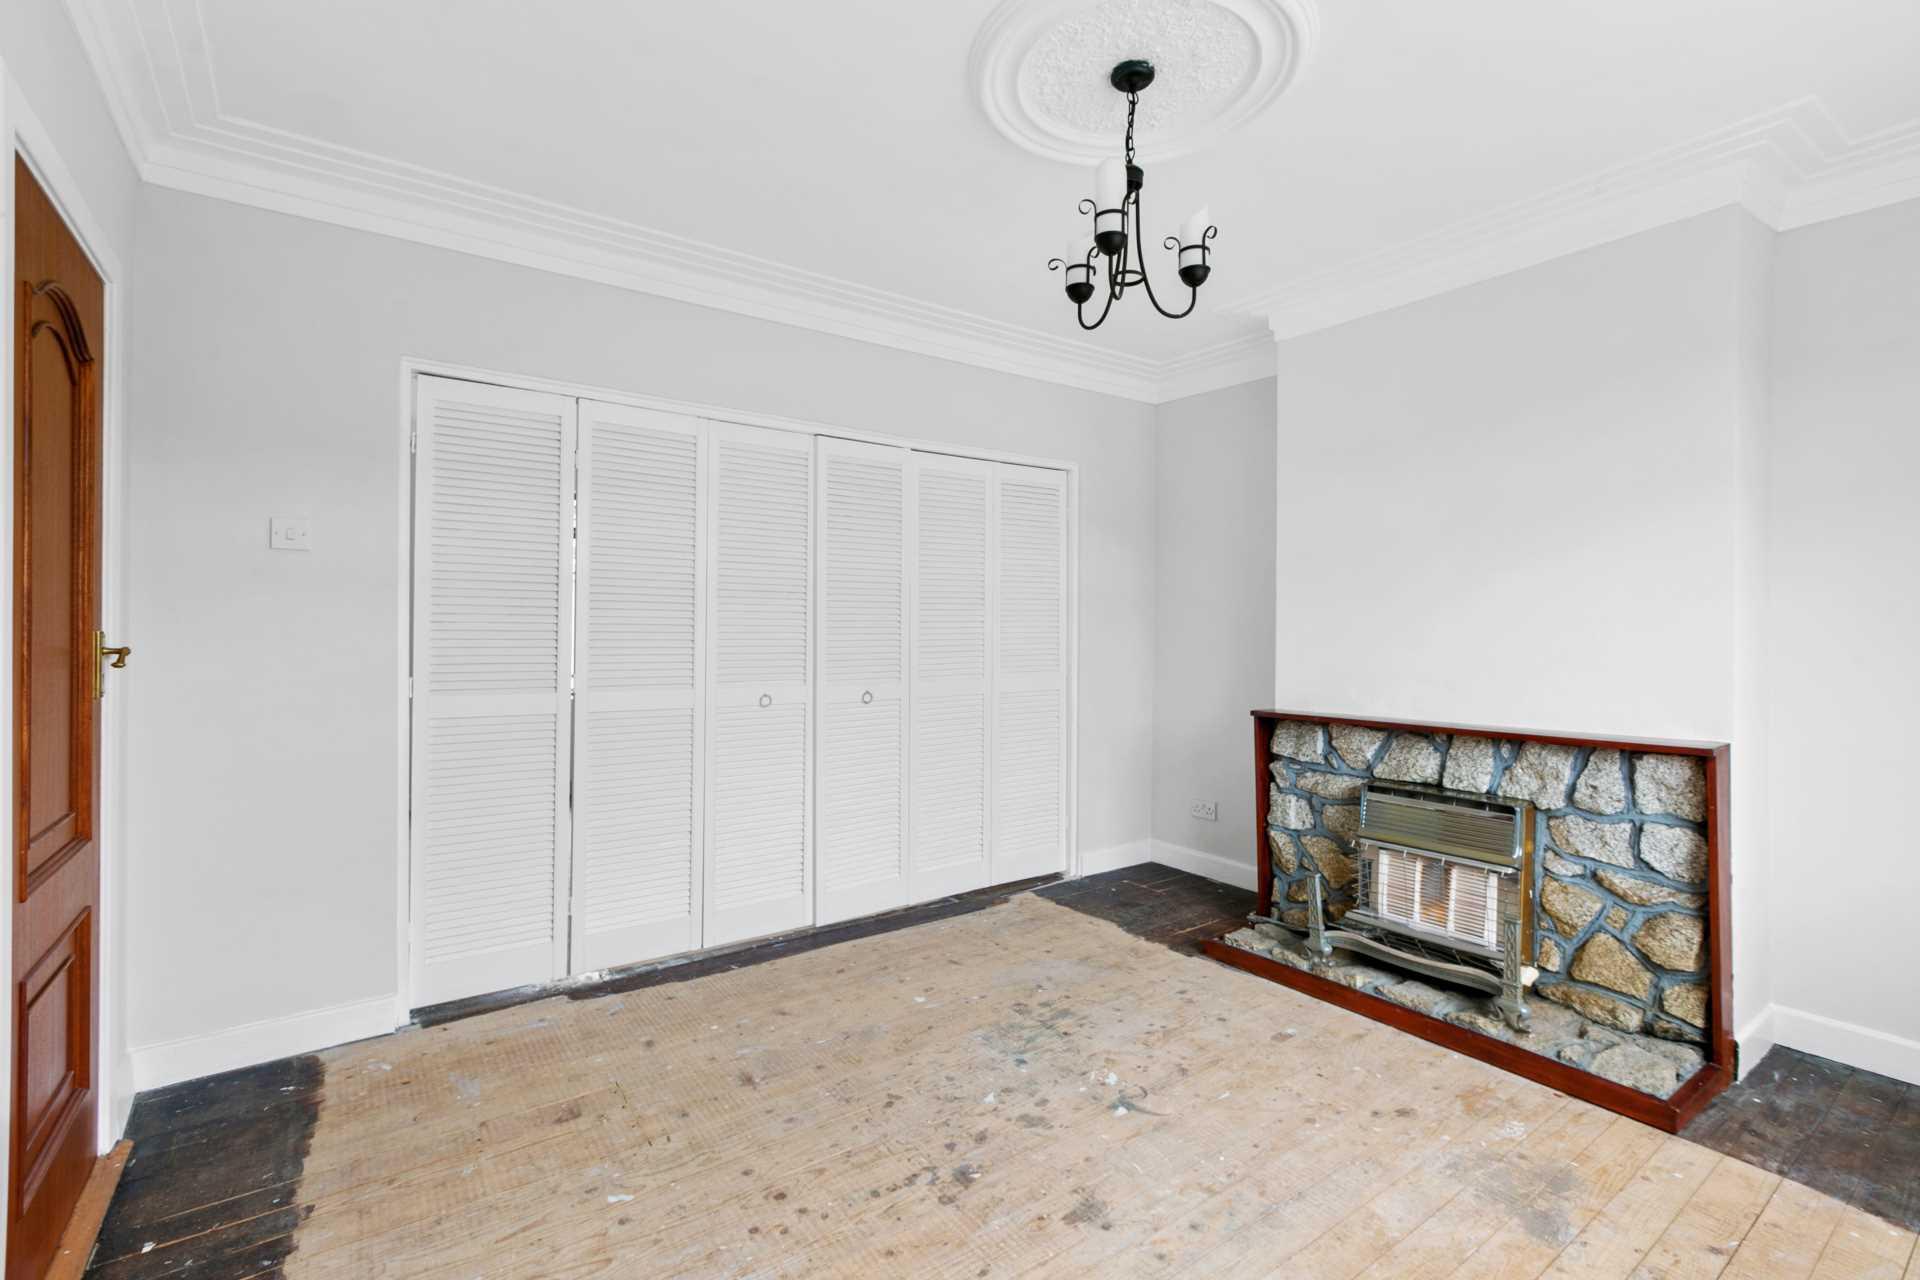 157 Whitehall Road West, Manor Estate, Terenure, Dublin 12, Image 5